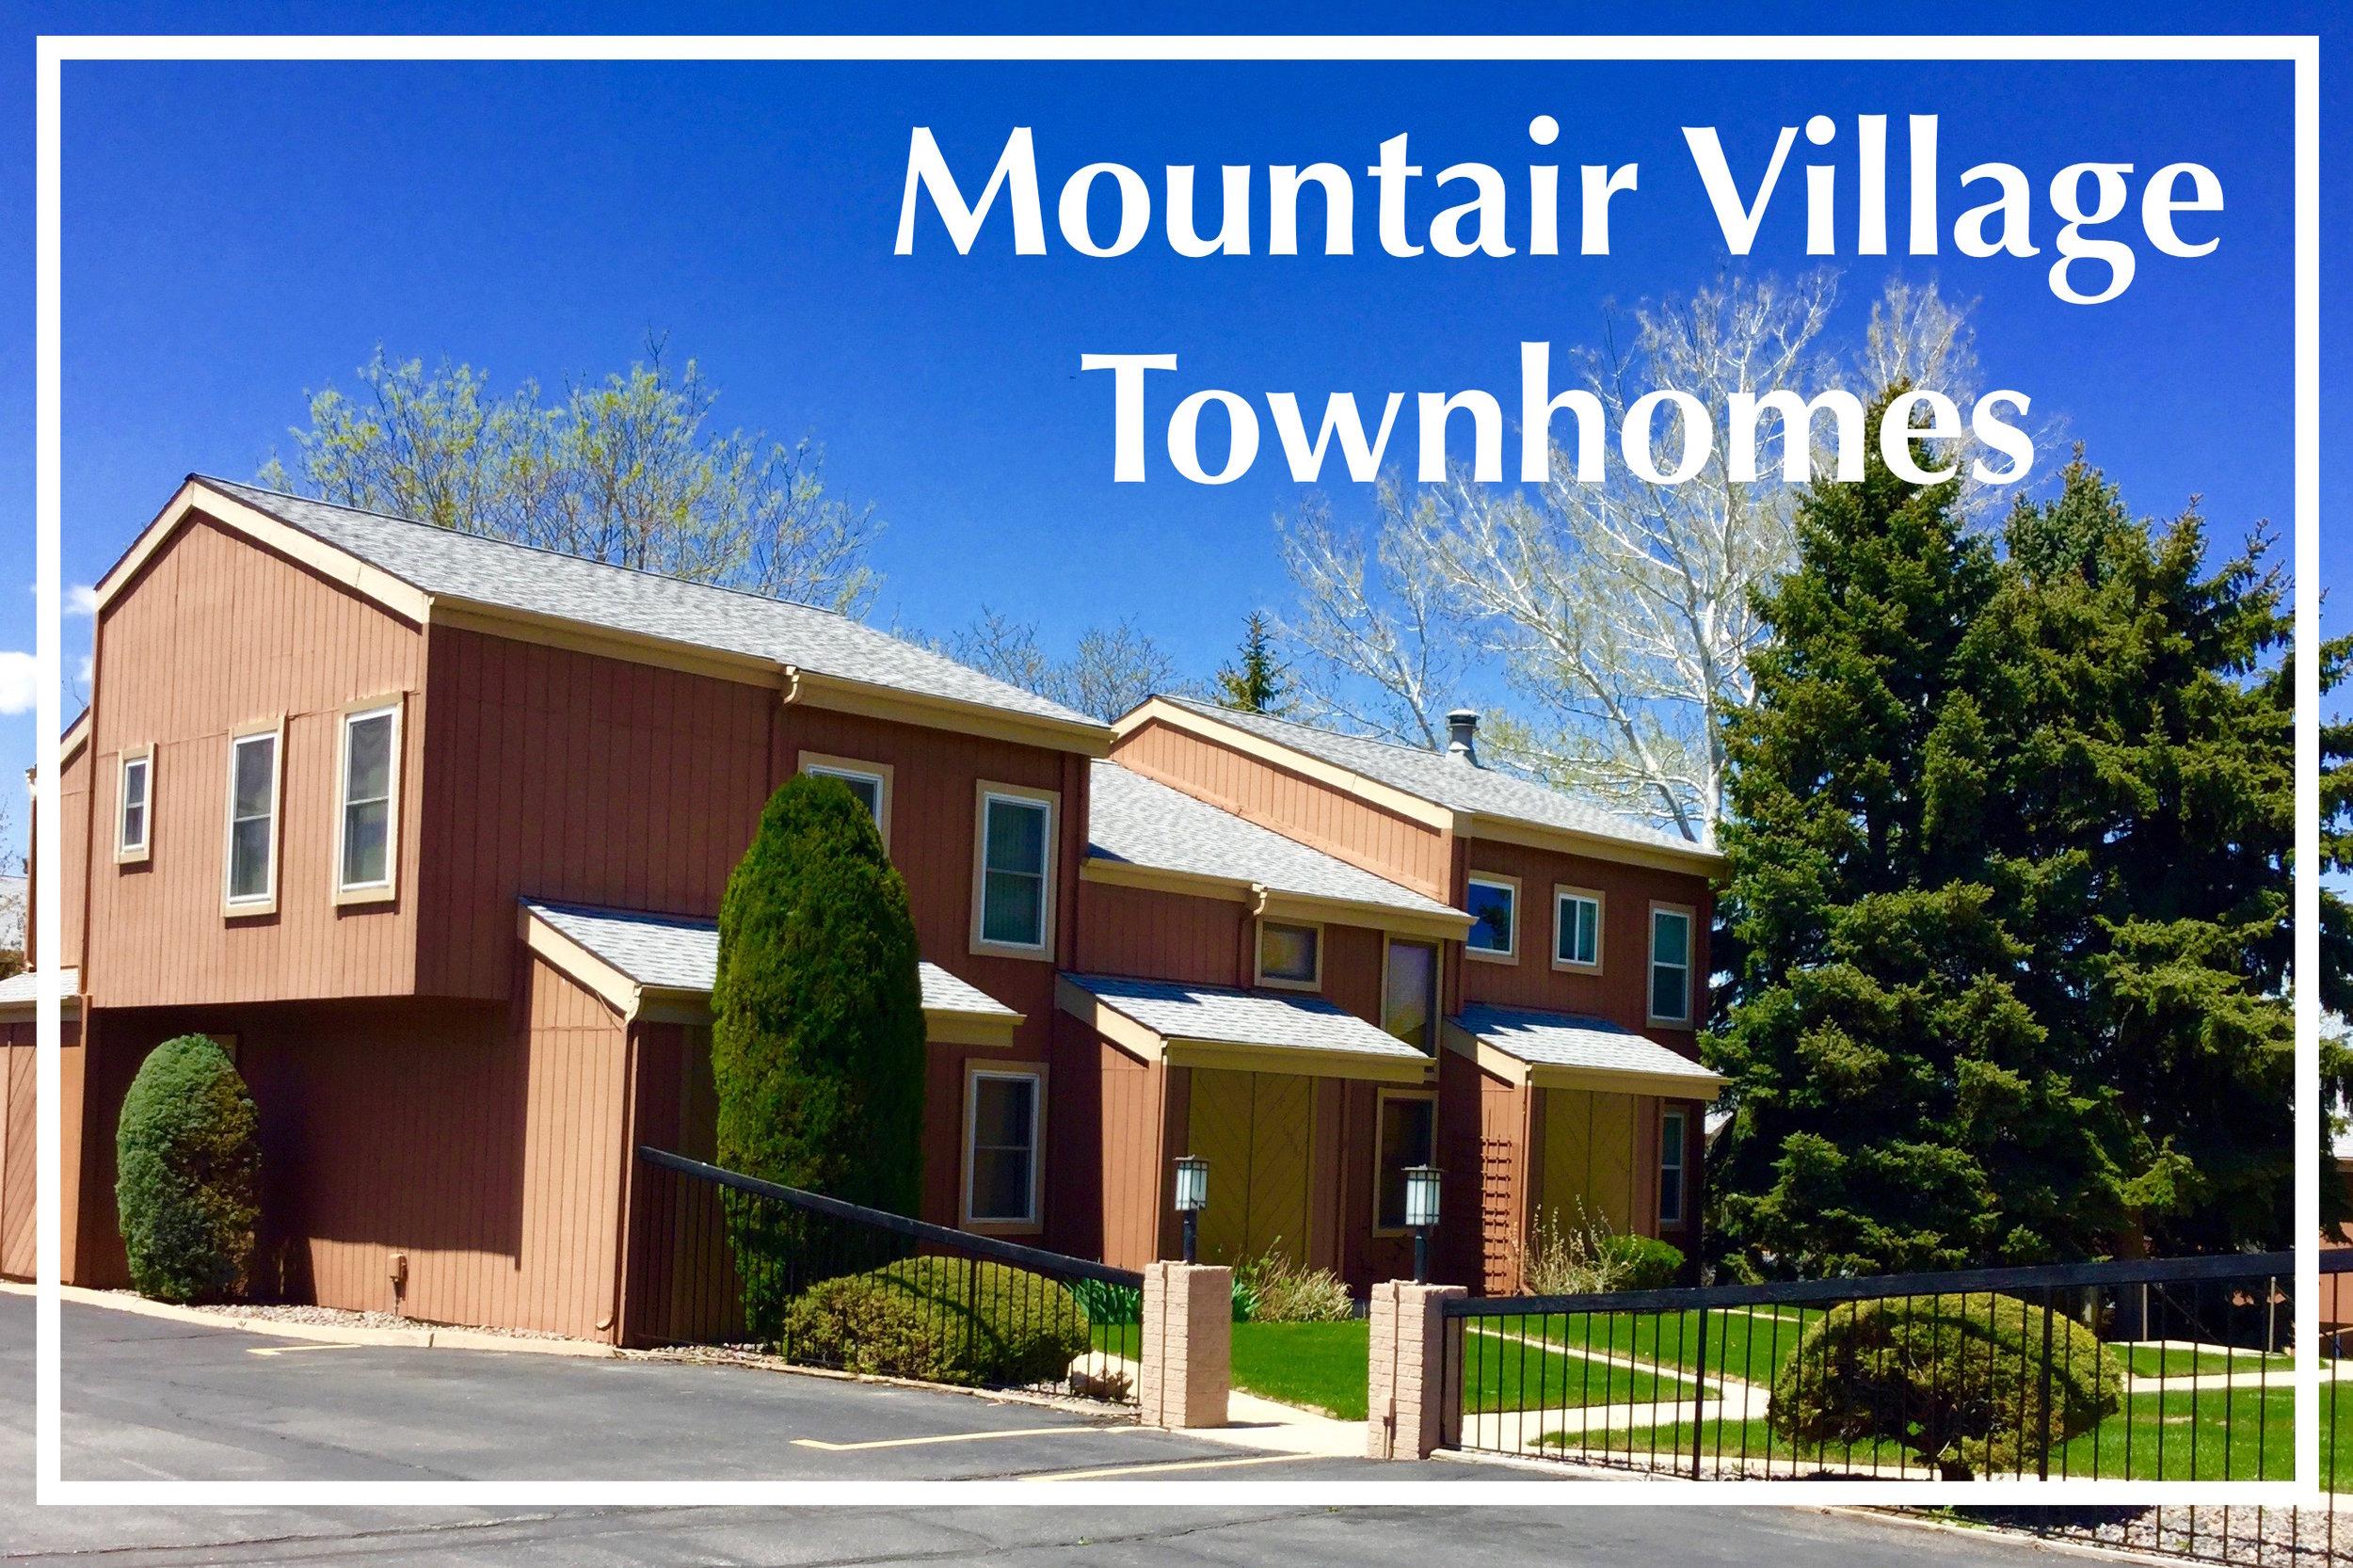 Mountair Village Townhomes.jpg